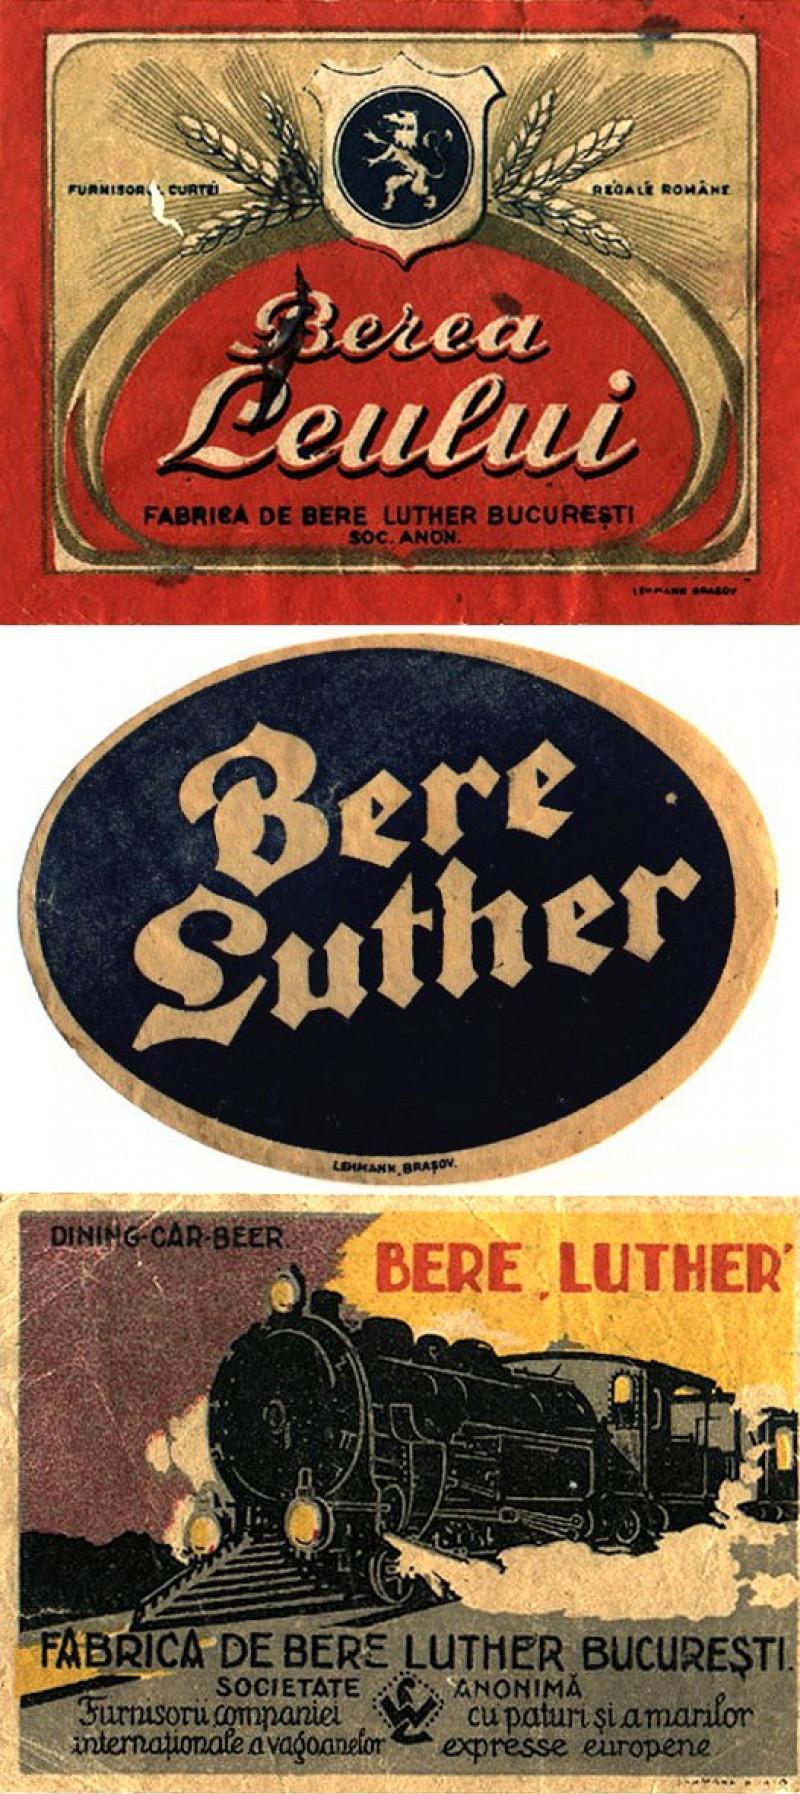 Fabrica de bere Luther   wikipedia.org